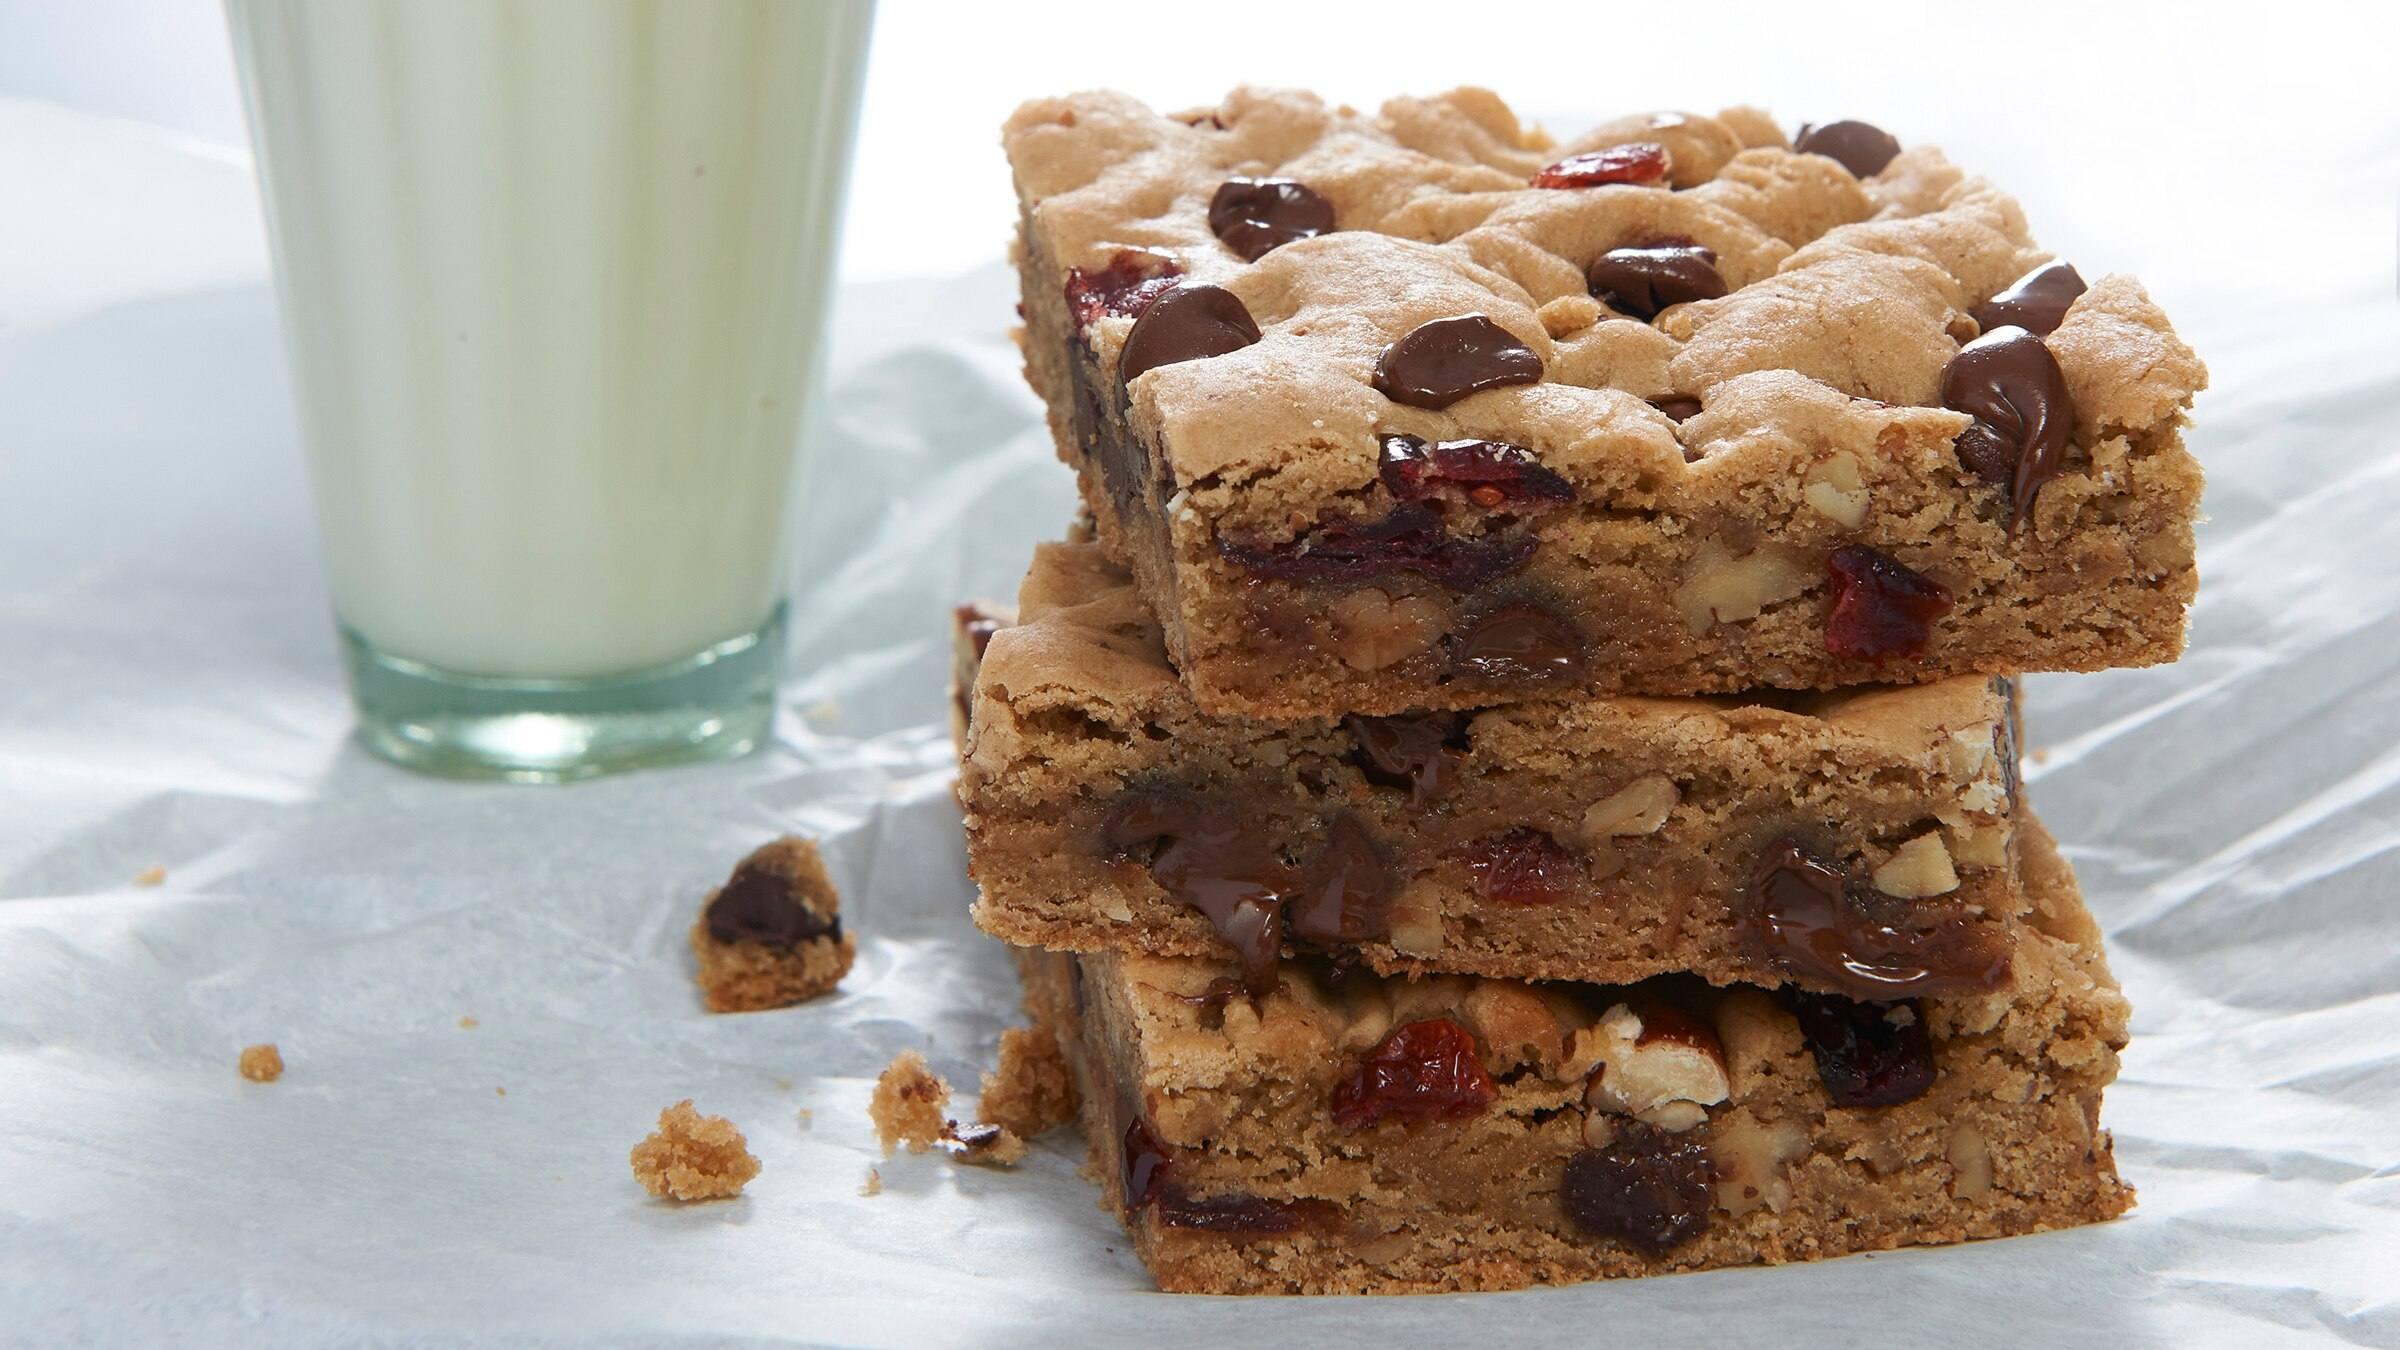 Vegan Choc-o-Chip Cookie Bars